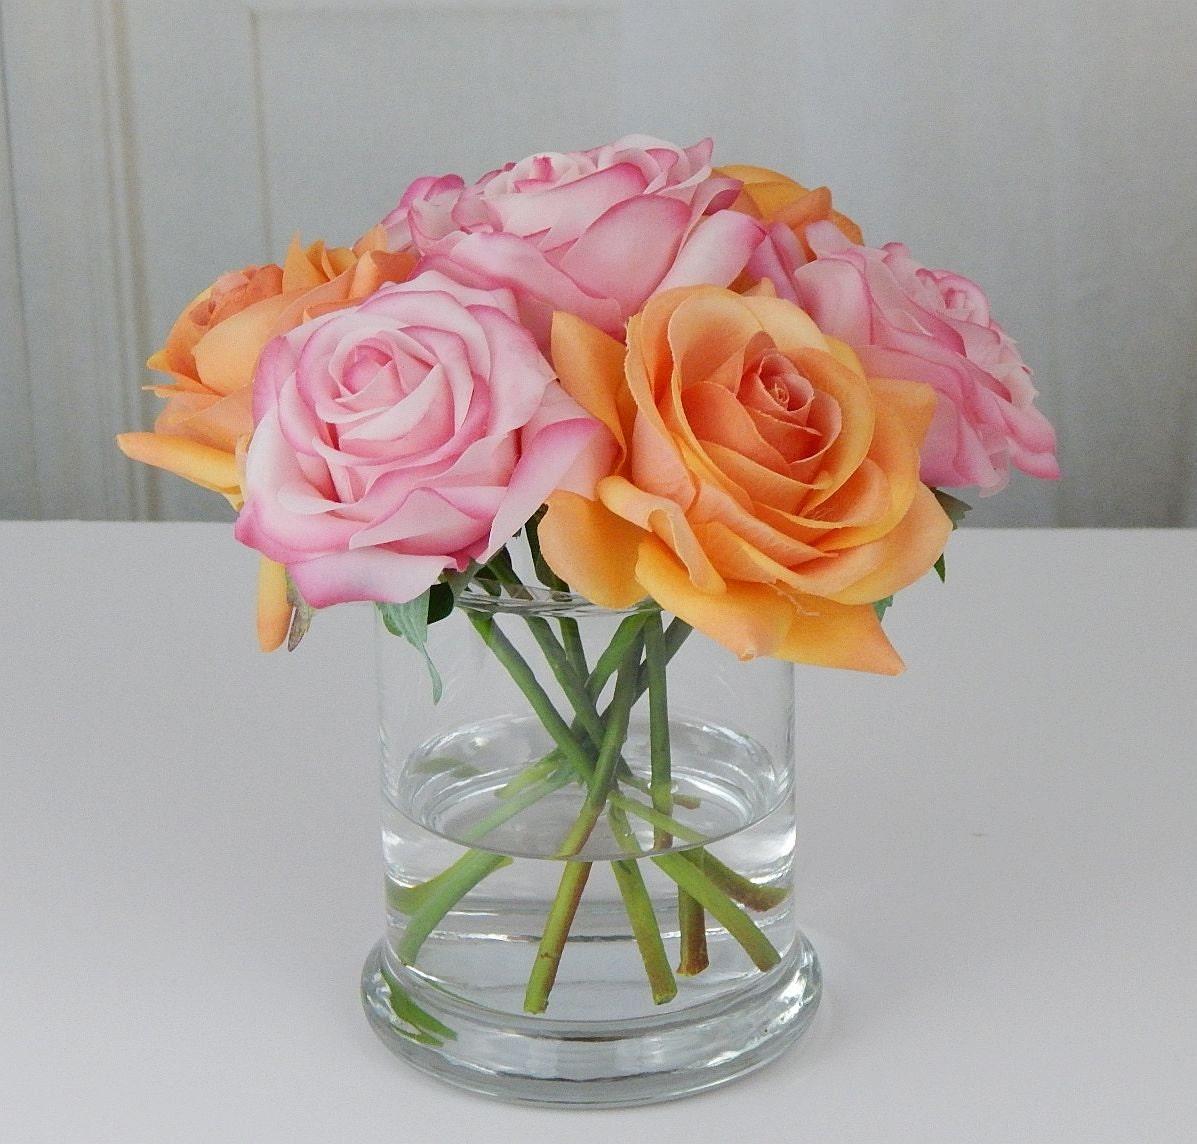 Pinkorange roseroses glass vase faux water acrylic illusion pinkorange roseroses glass vase faux water acrylic illusion silk real touch flowers floral arrangement centerpiece waterlook reviewsmspy